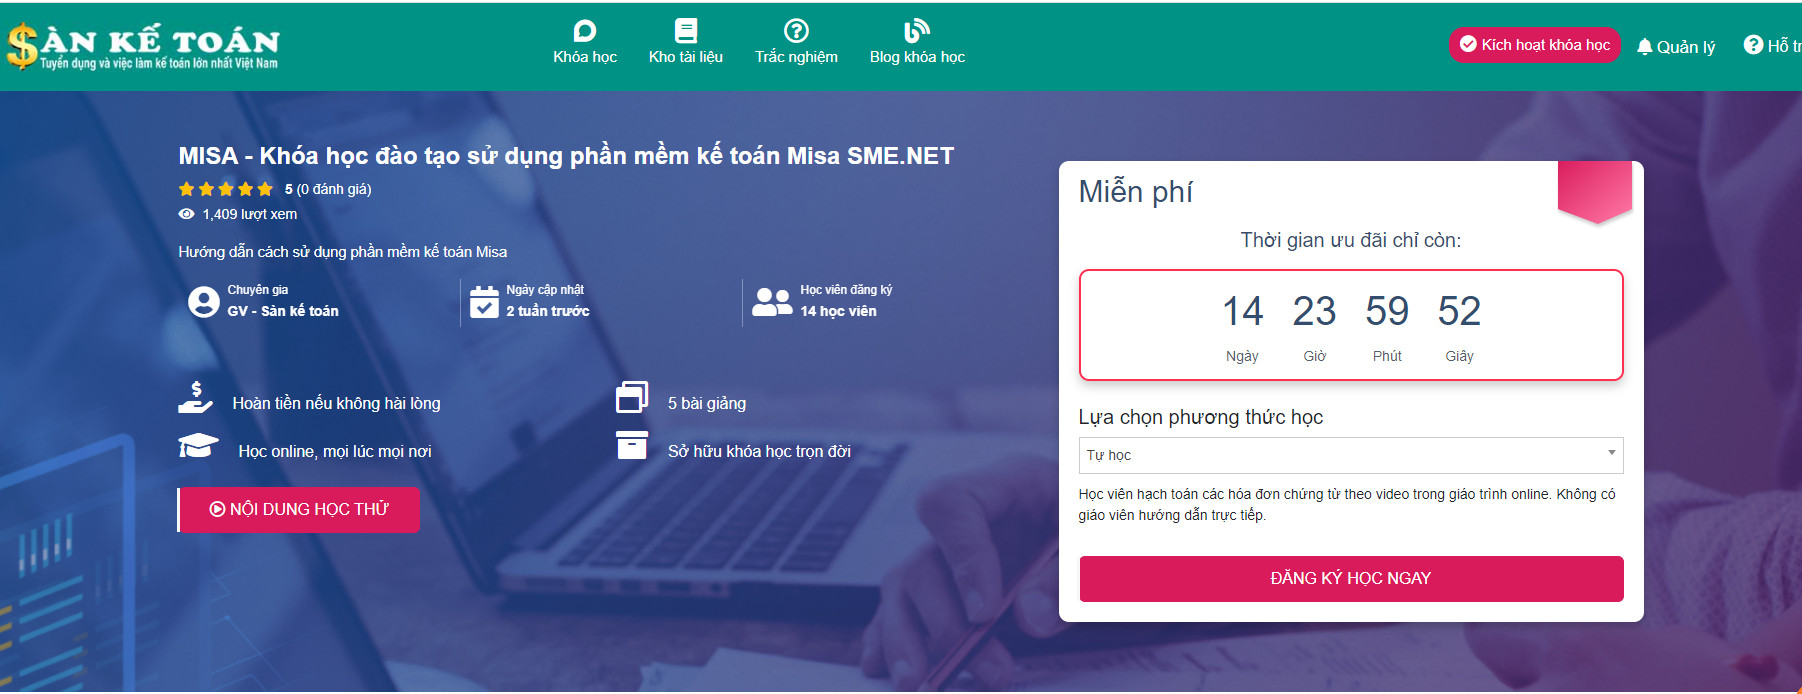 Khóa học căn bản sử dụng phần mềm MISA SME.NET 2021